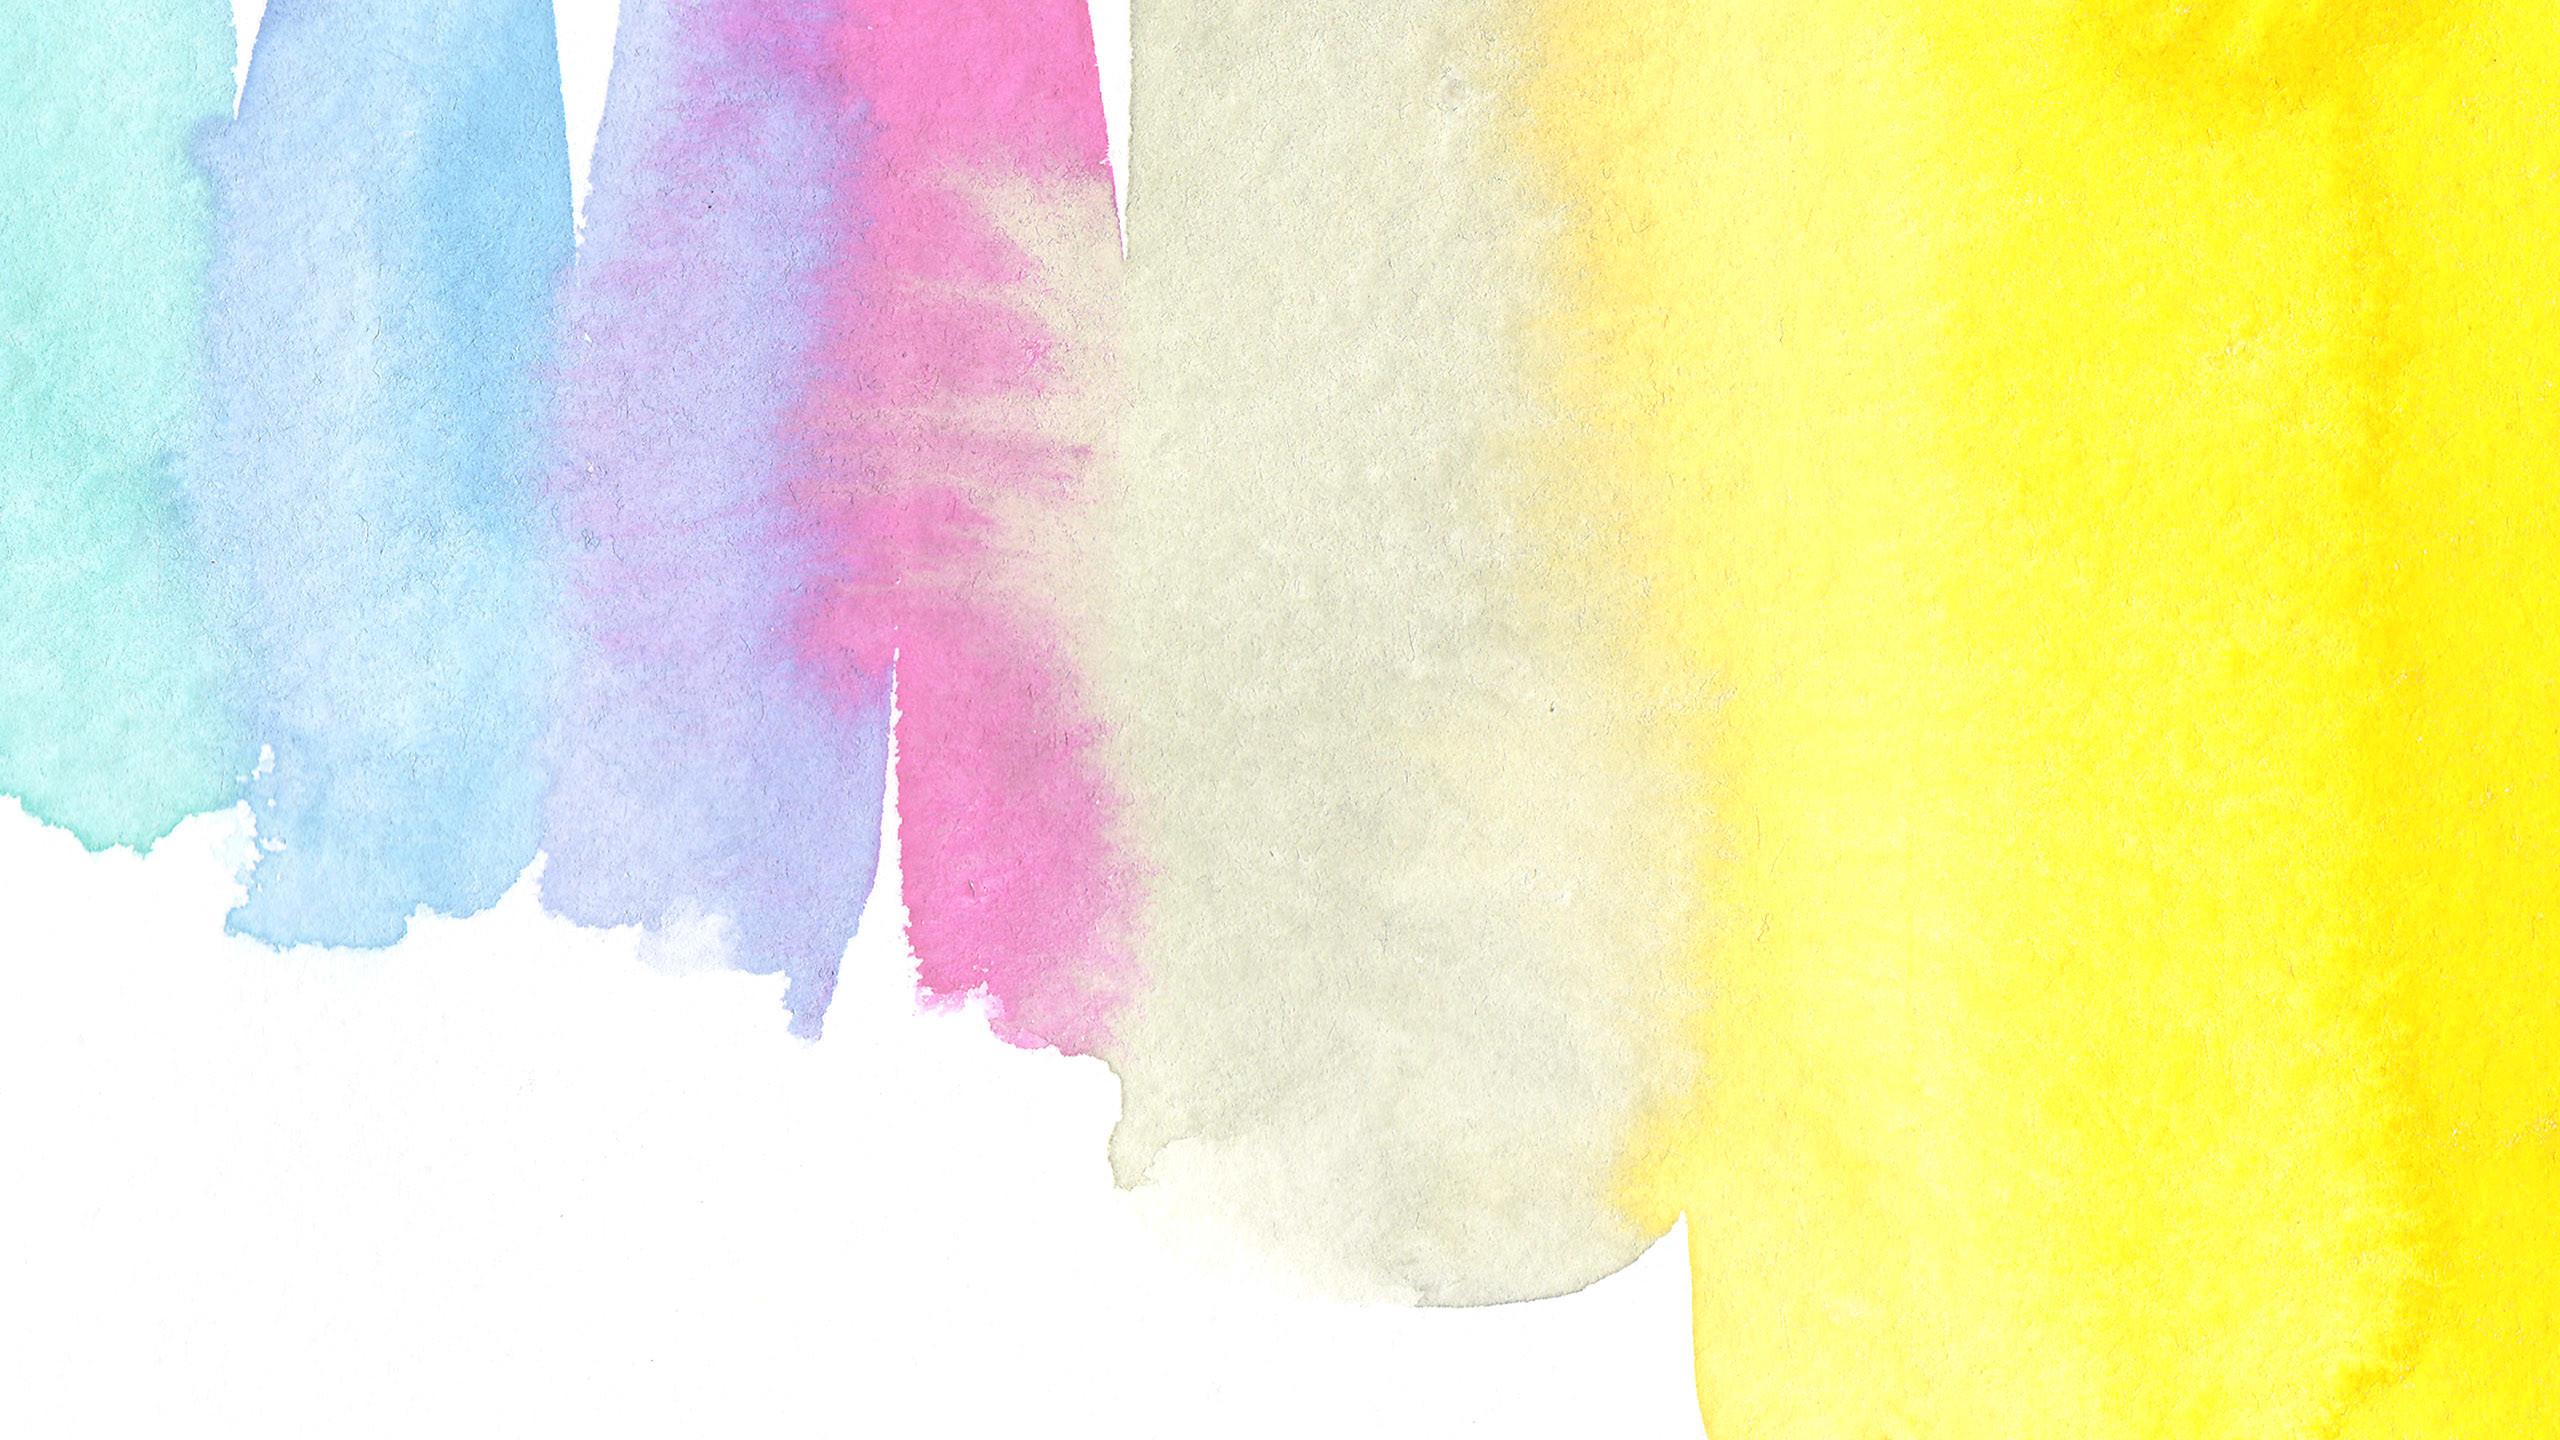 Watercolor Wallpapers For Desktop 53 Images